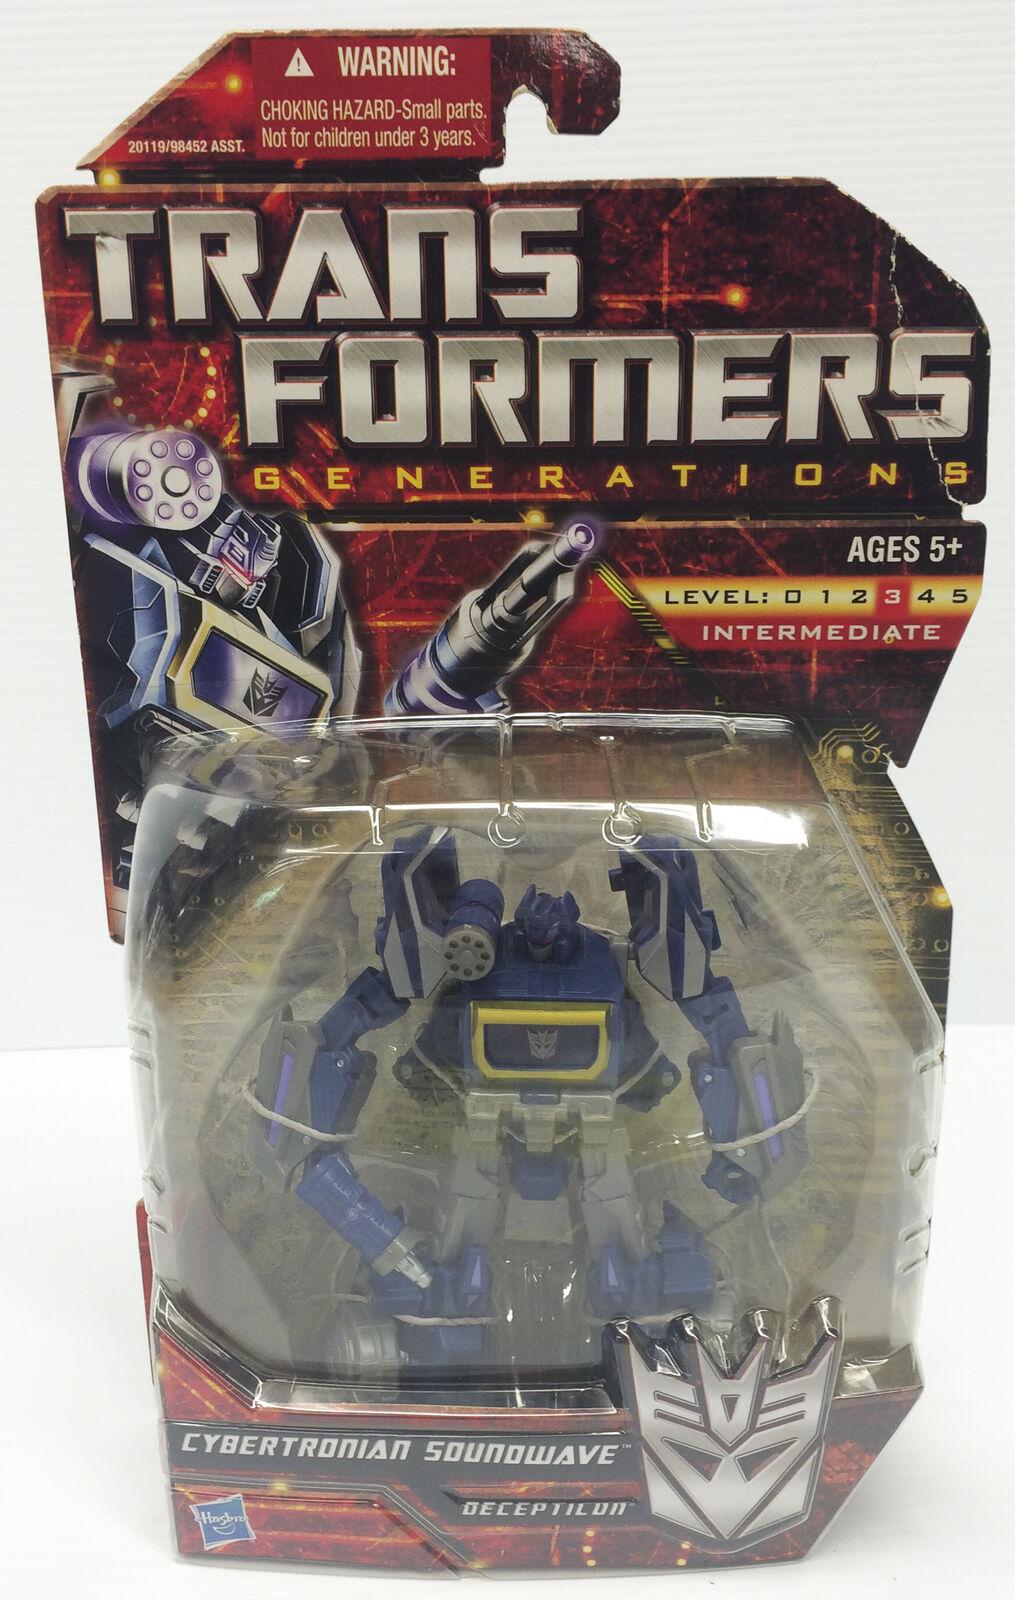 Transformers CYBERTRONIAN SOUNDWAVE Decepticon Hasbro Action Figure NIB Cleaned